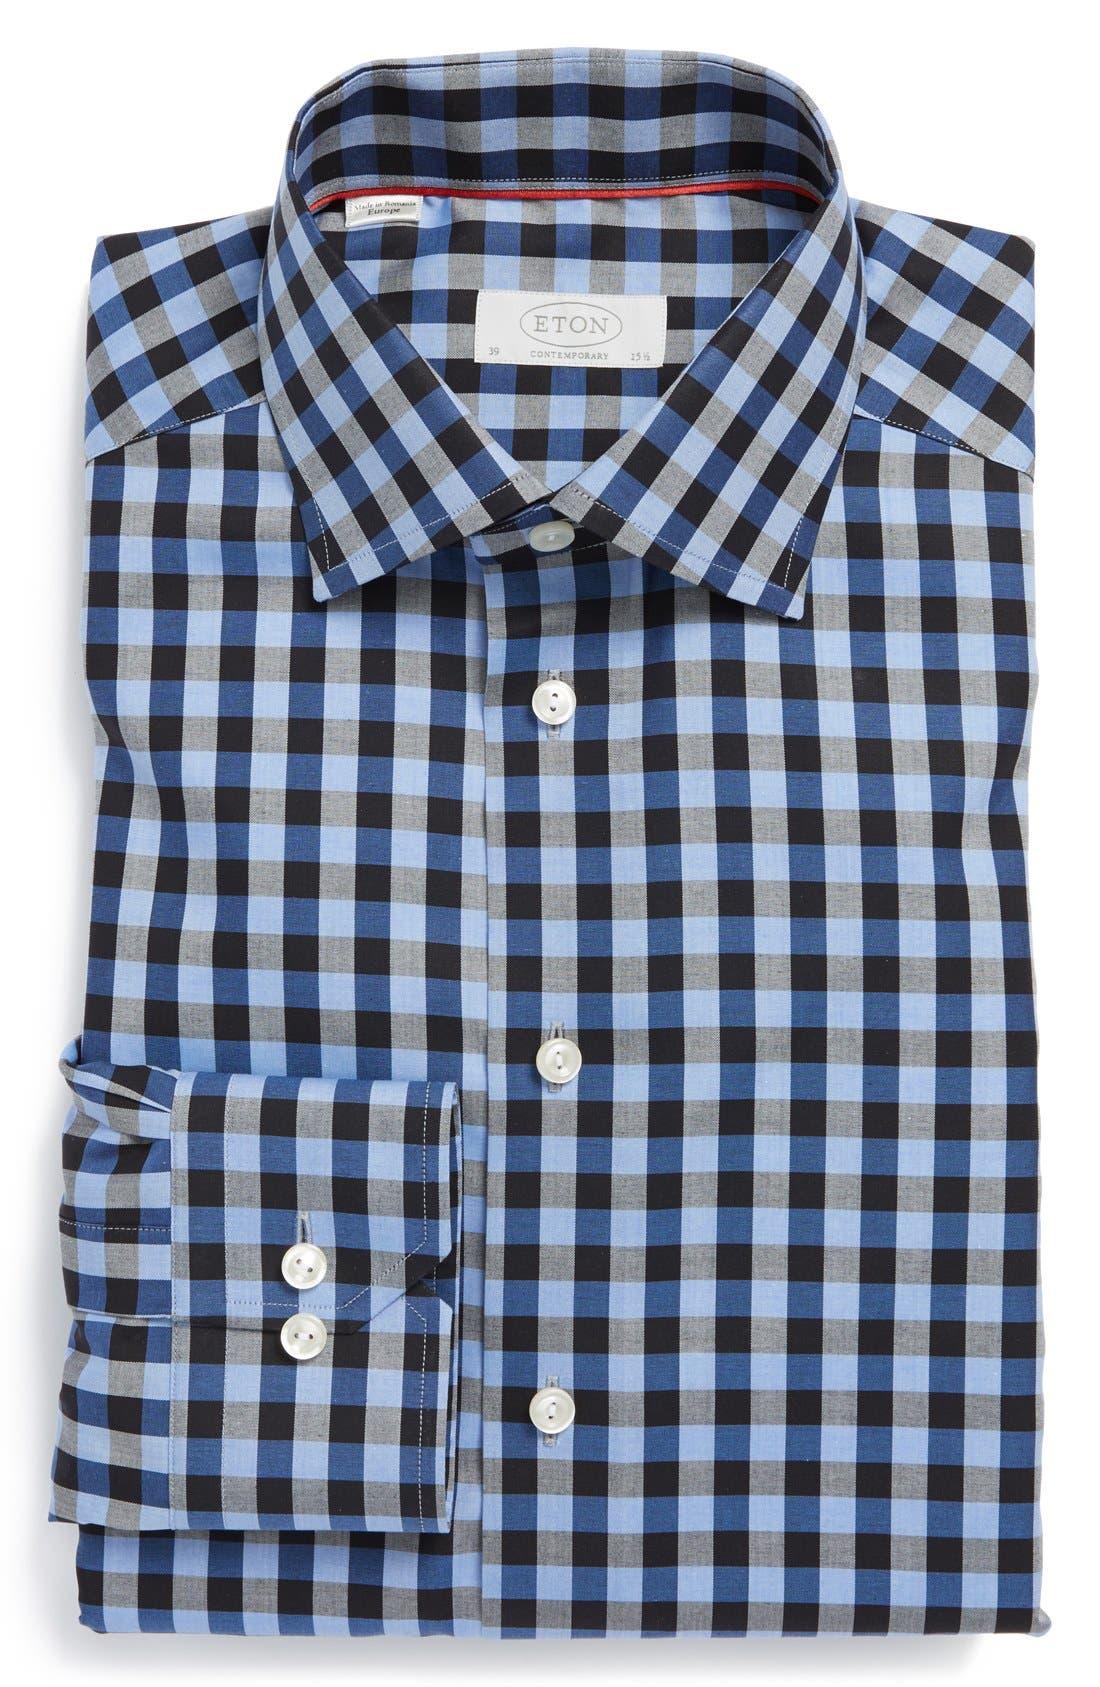 Alternate Image 1 Selected - Eton Contemporary Check Dress Shirt